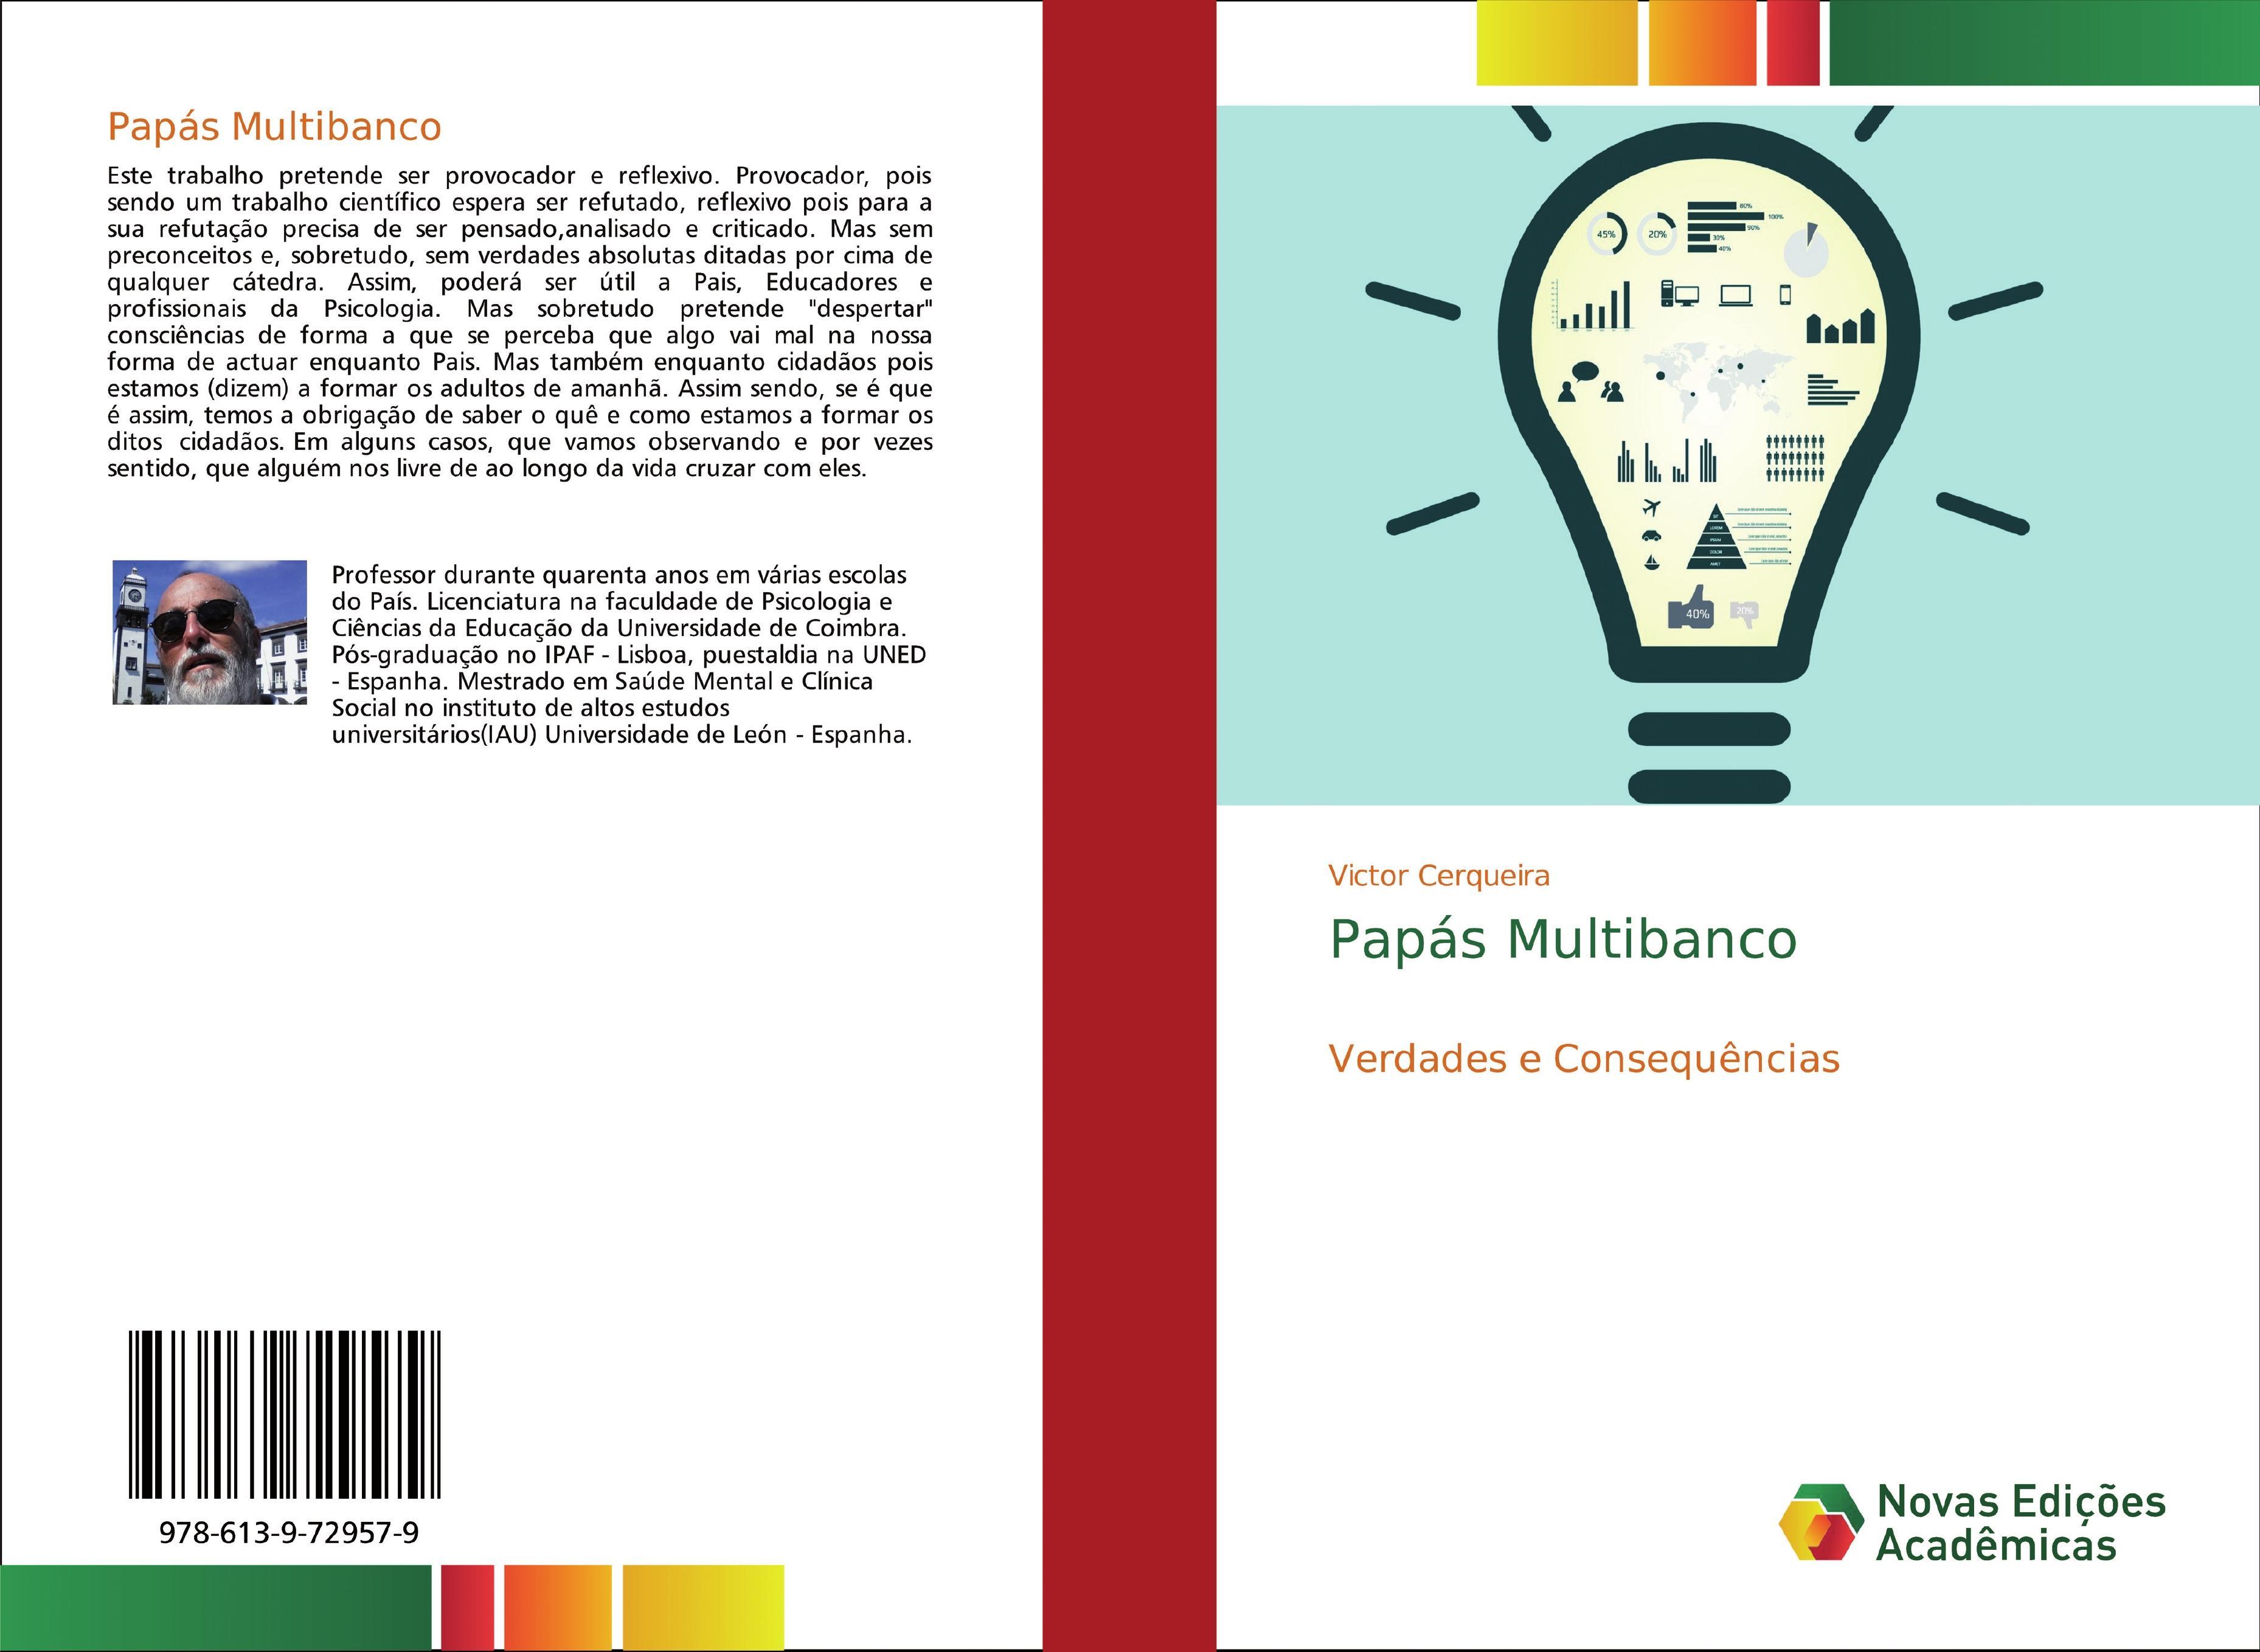 Papás Multibanco  Verdades e Consequências  Victor Cerqueira  Taschenbuch  Paperback  Portugiesisch  2019